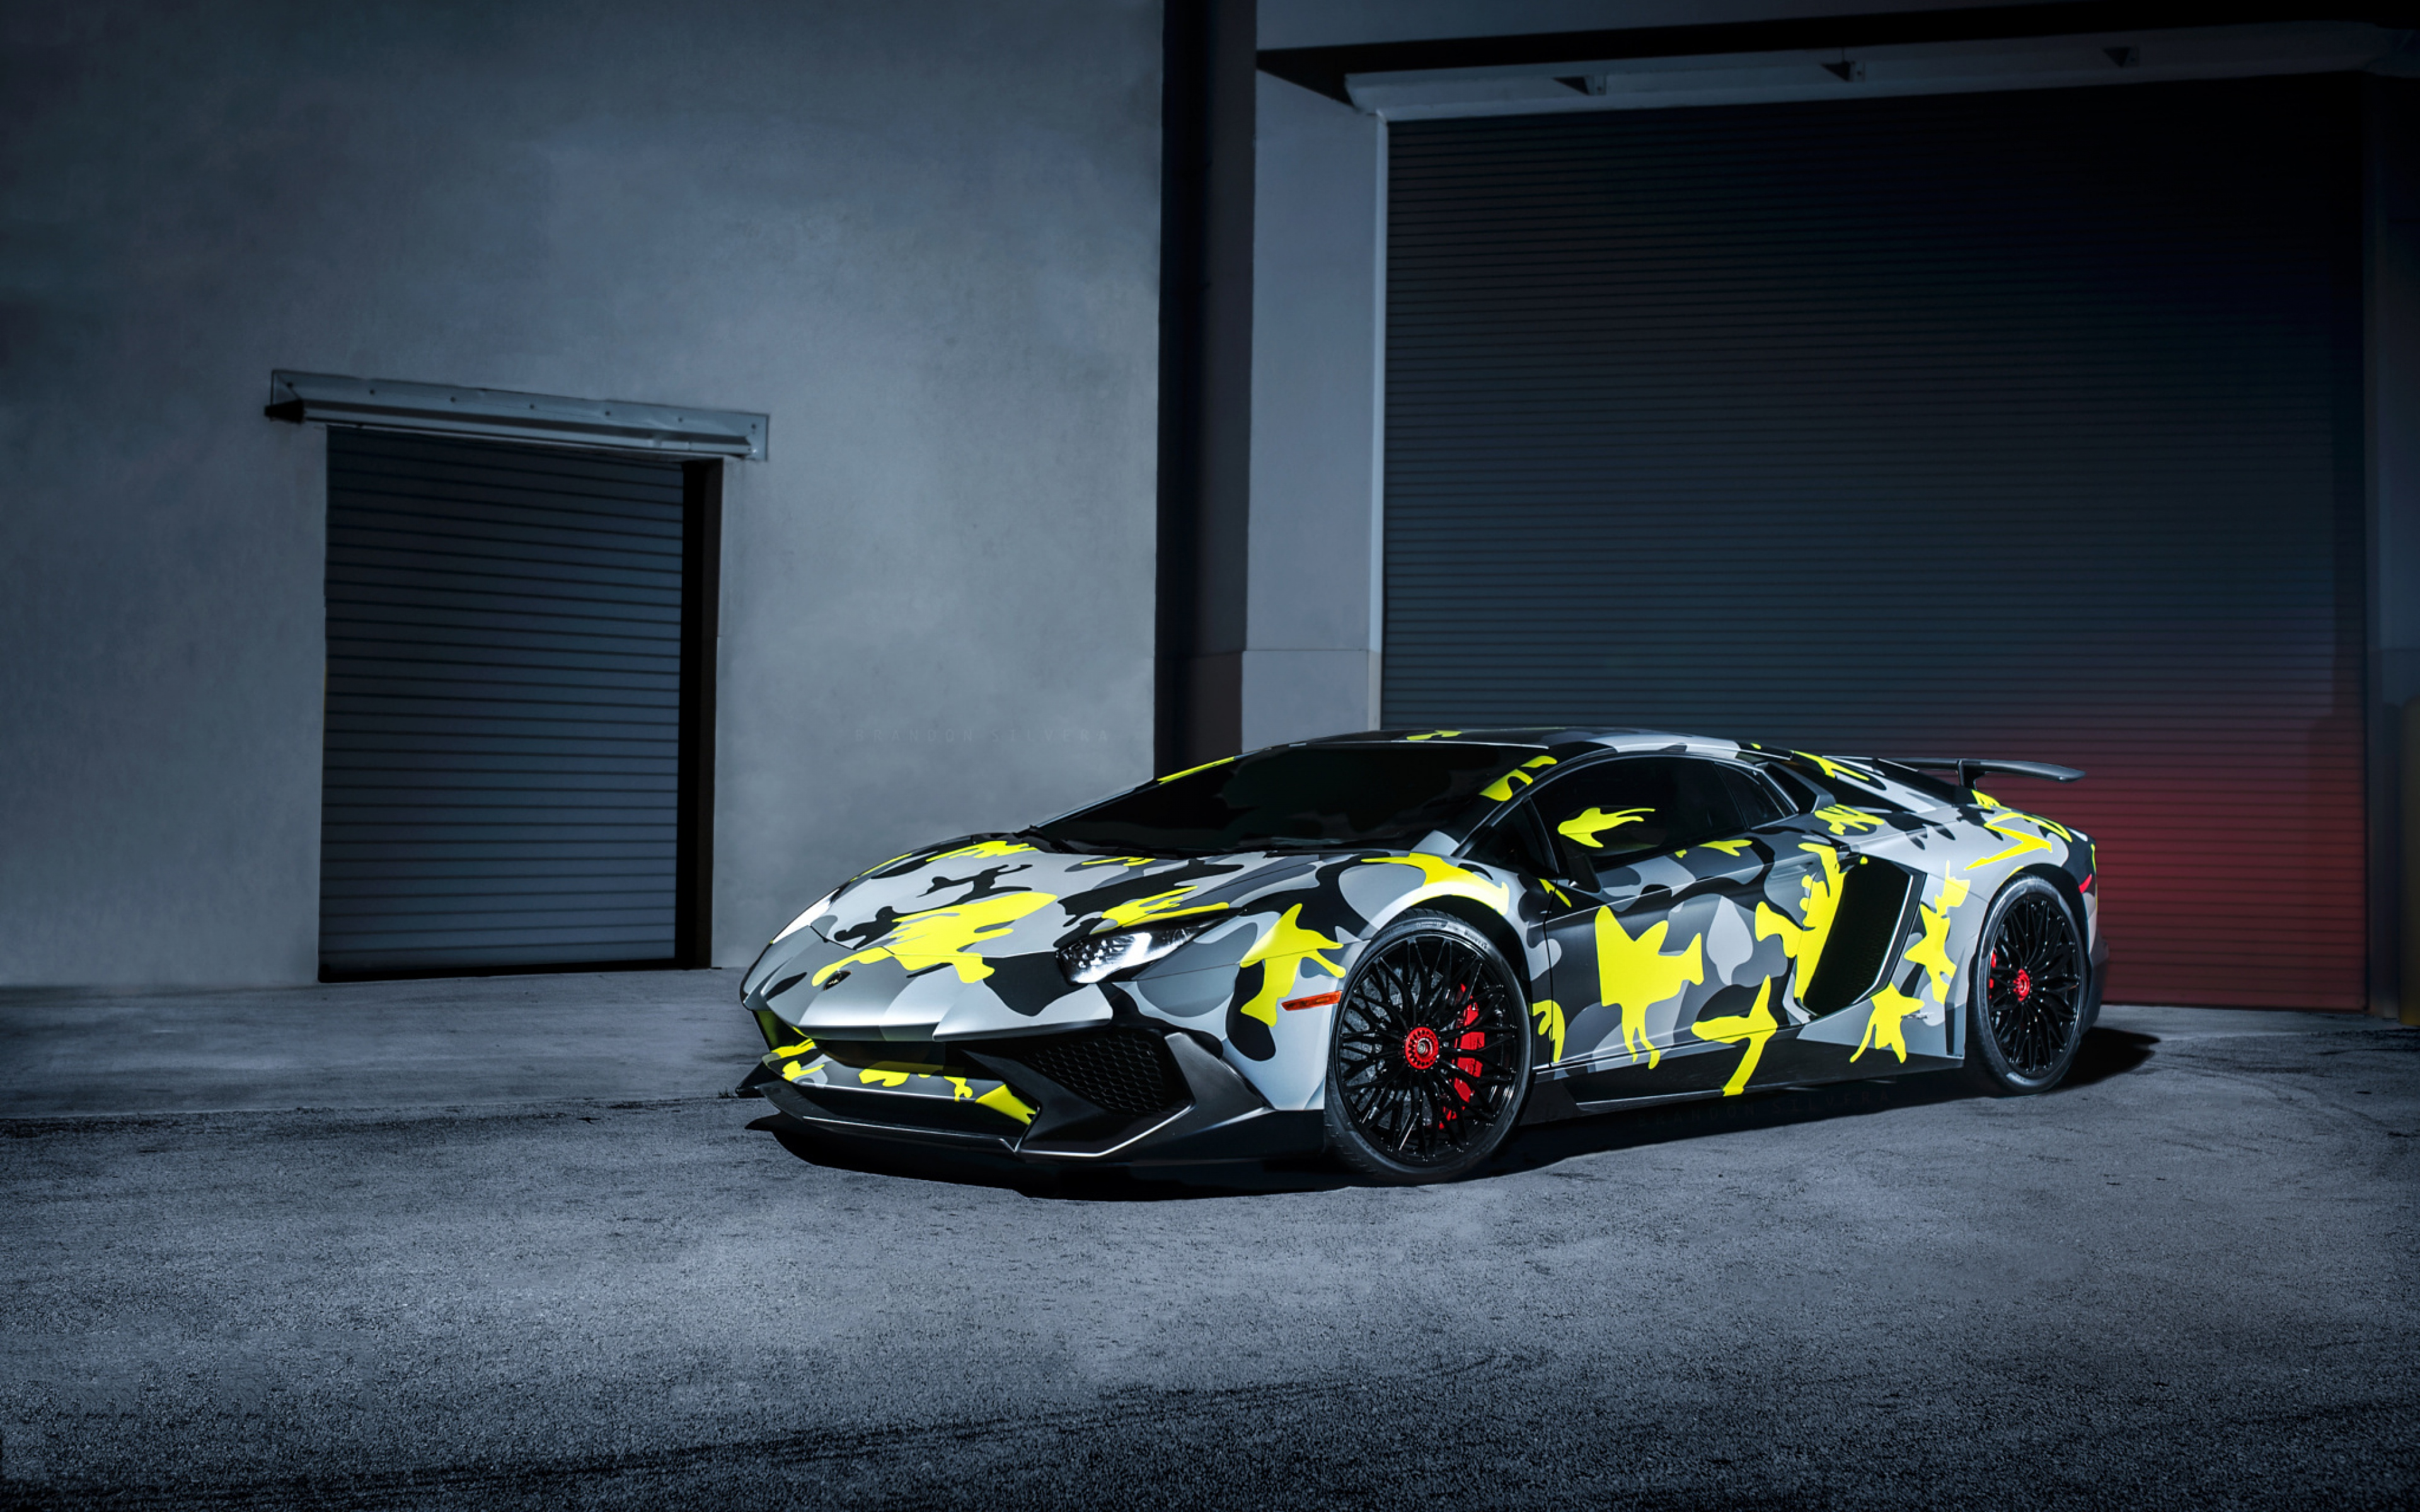 Lamborghini Aventador SV HD Wallpapers 3840x2400